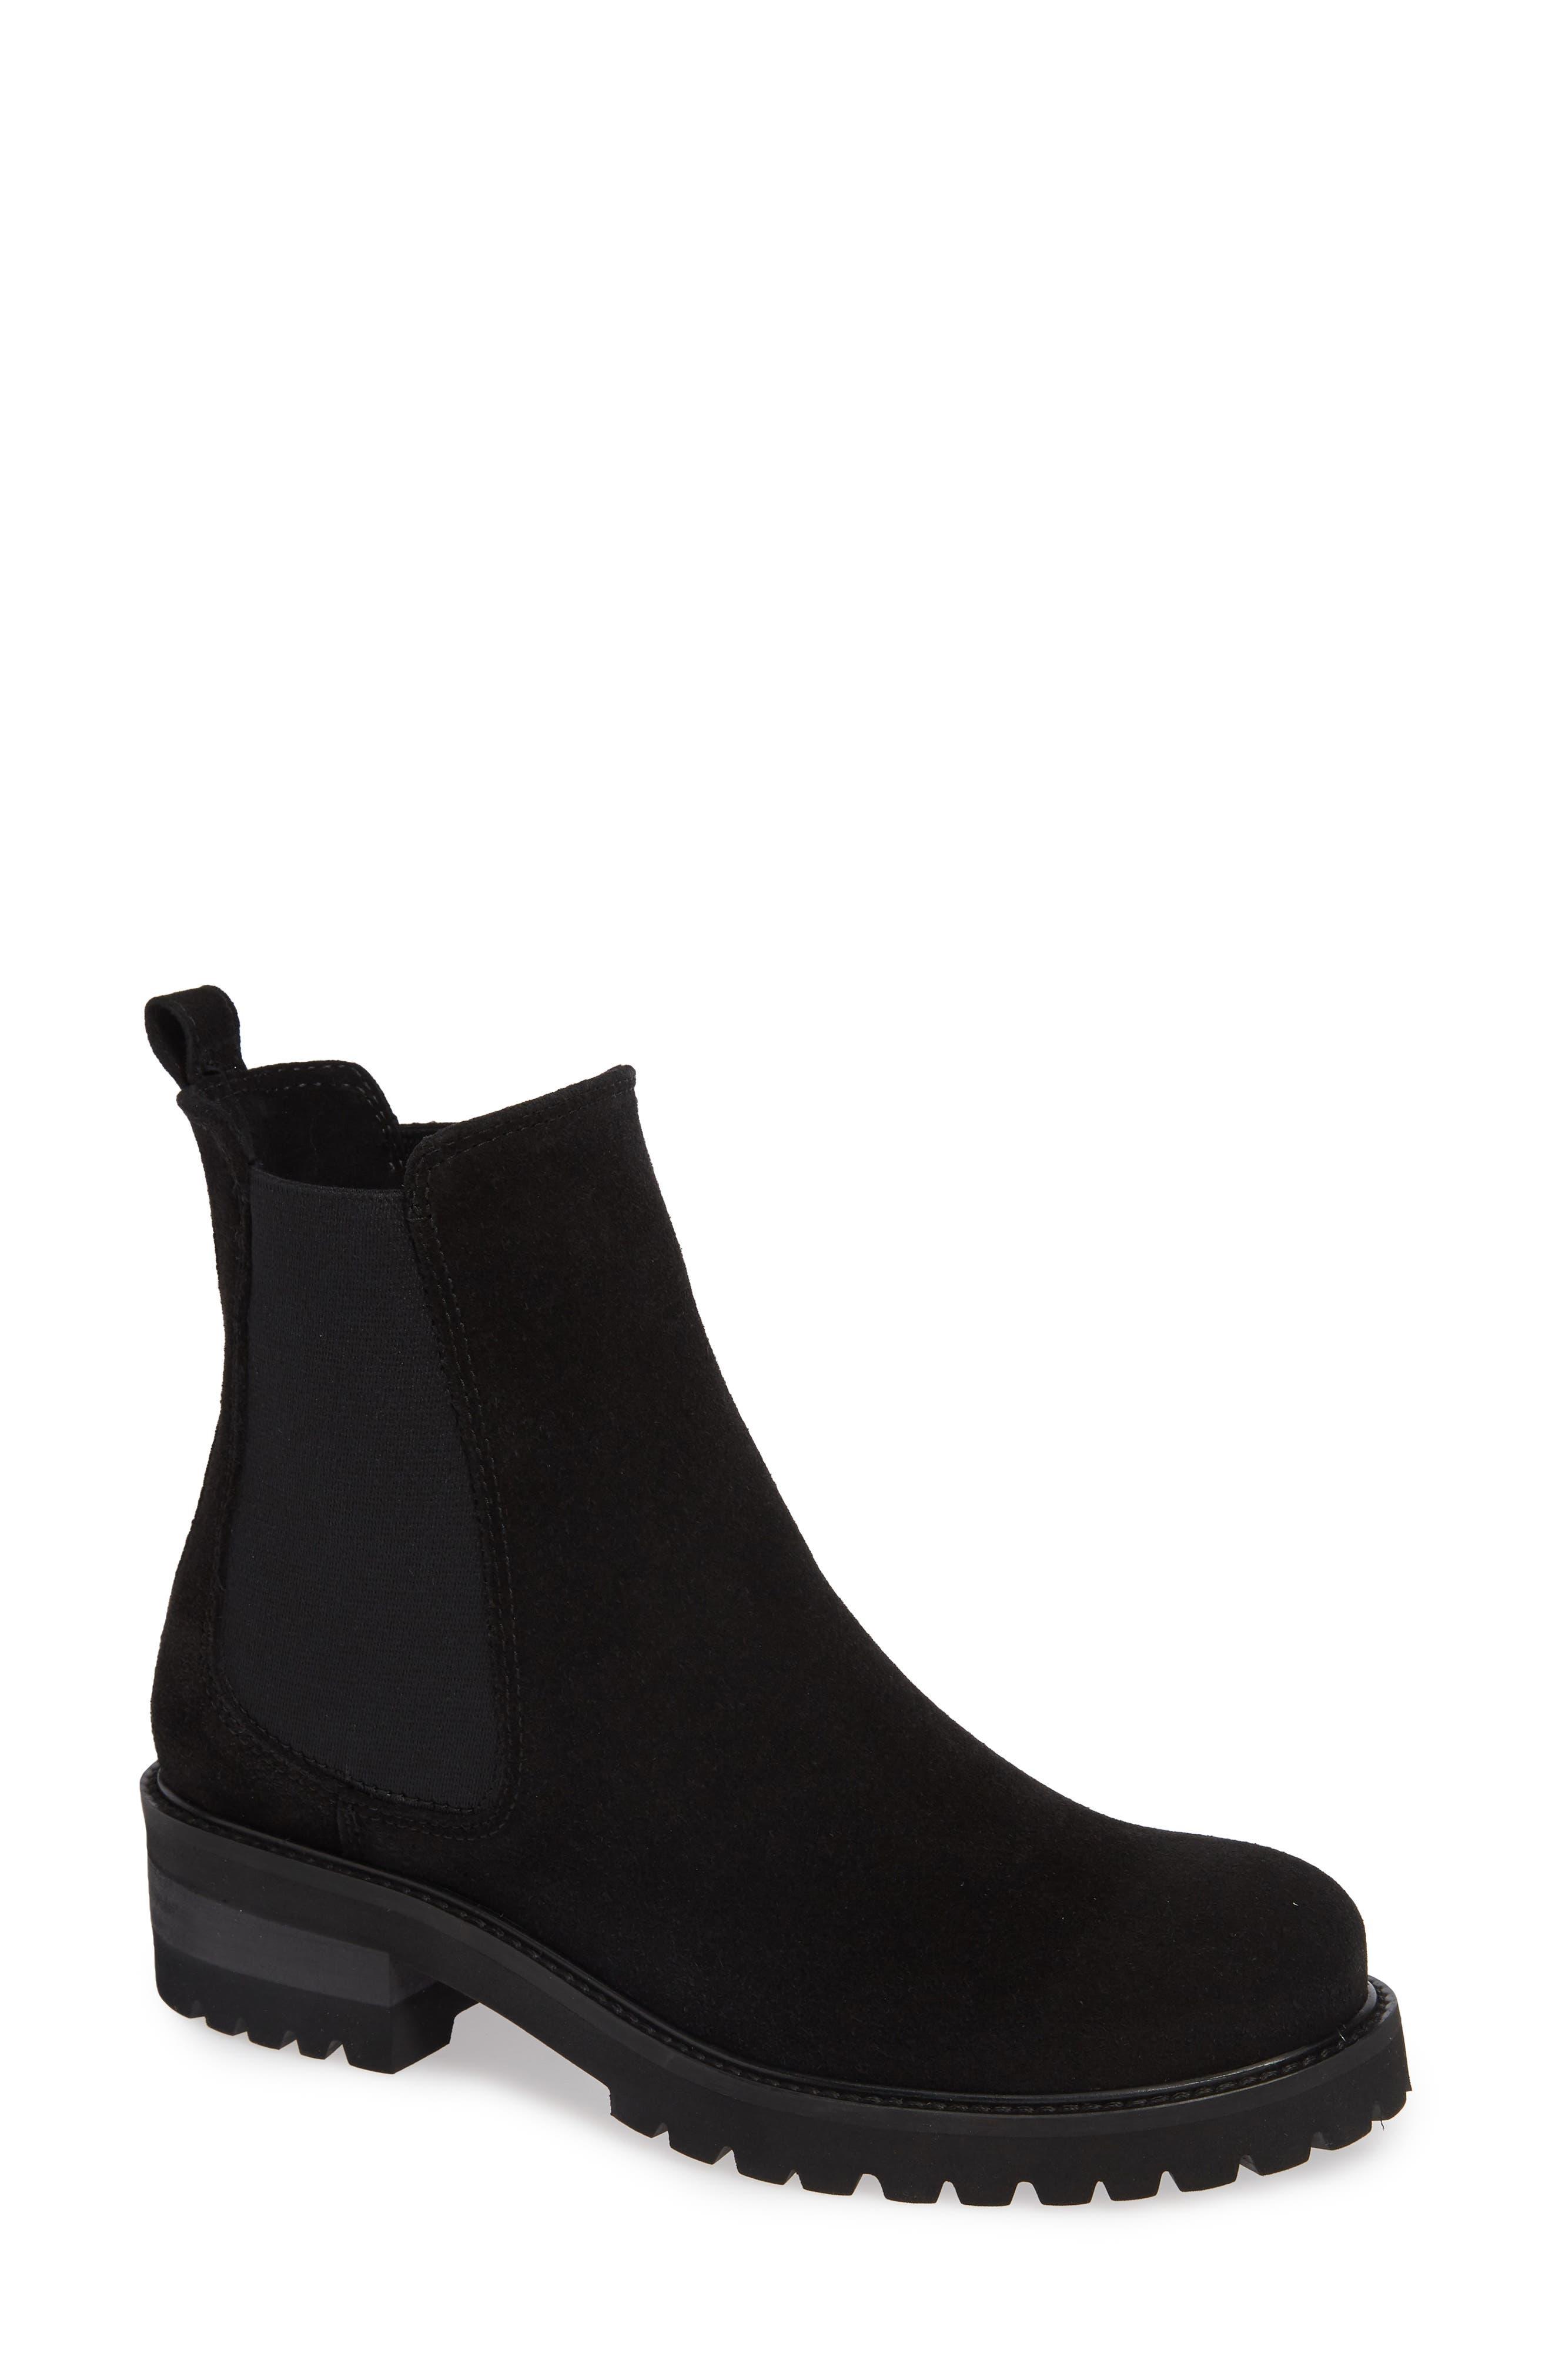 8096b1df9 La Canadienne Connor Waterproof Boot, Black